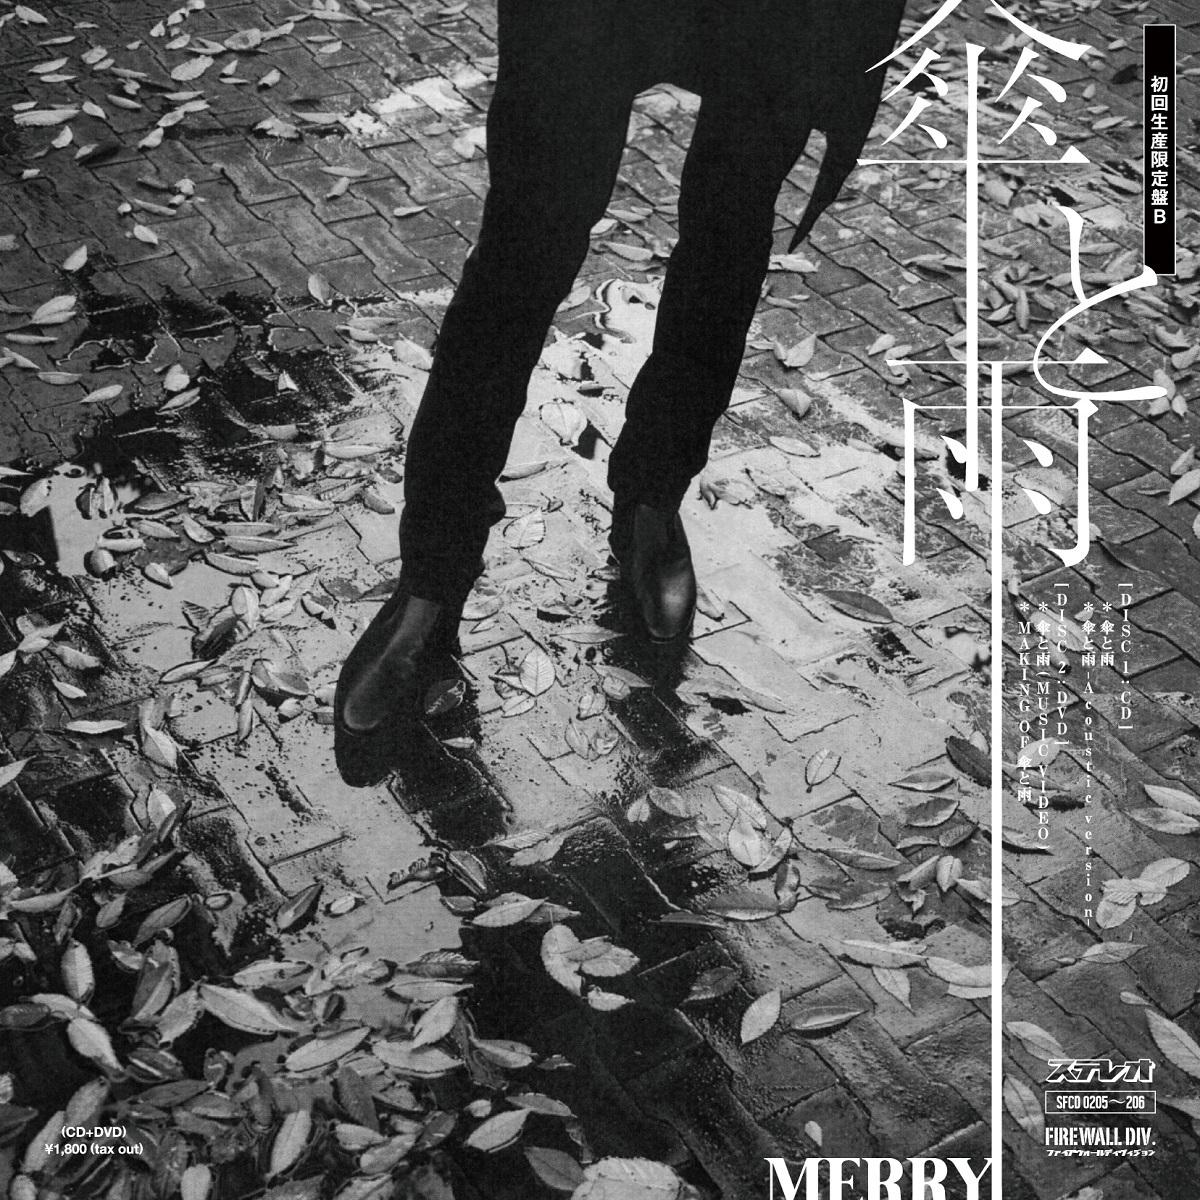 MERRY初回盤B